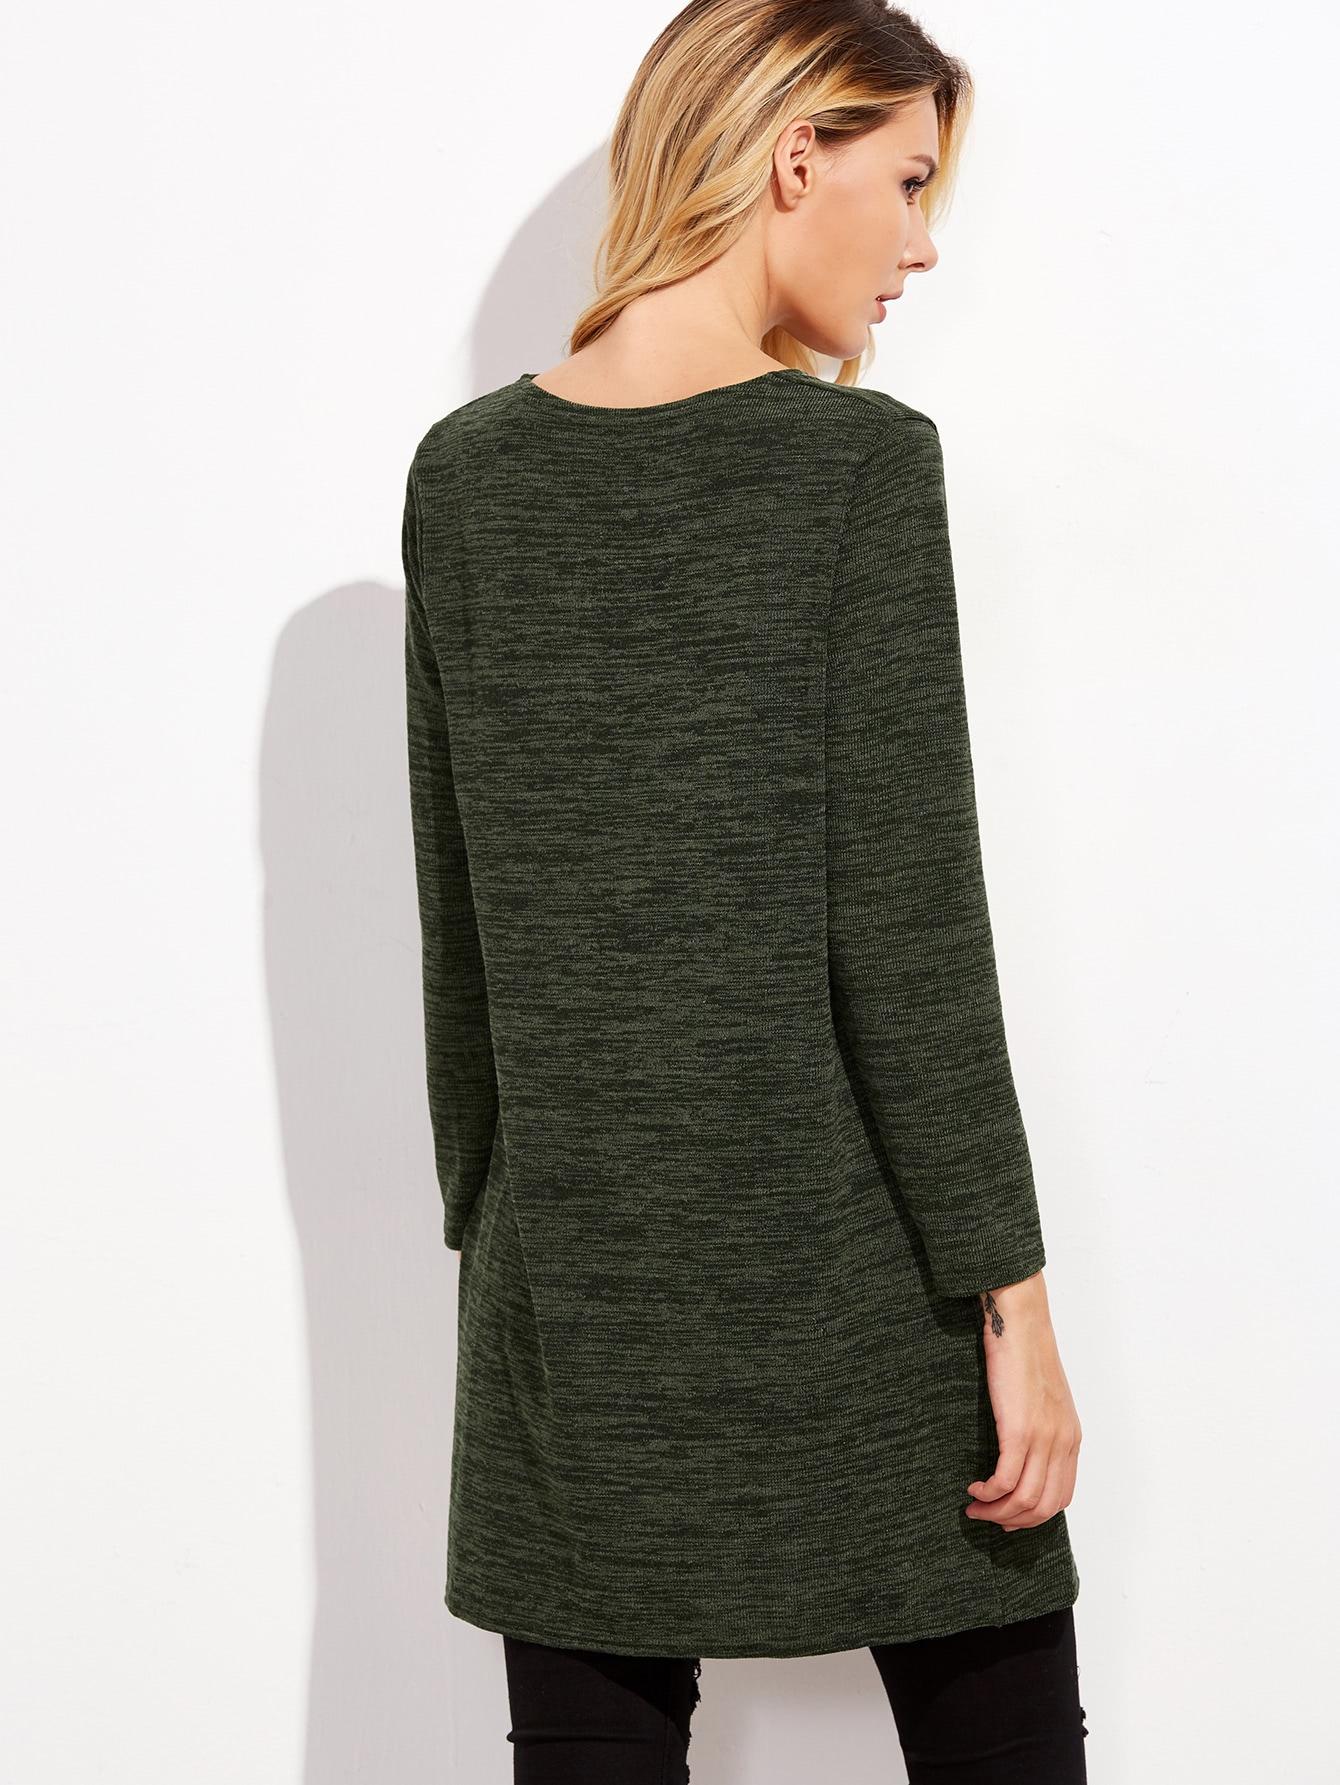 sweater160922105_2